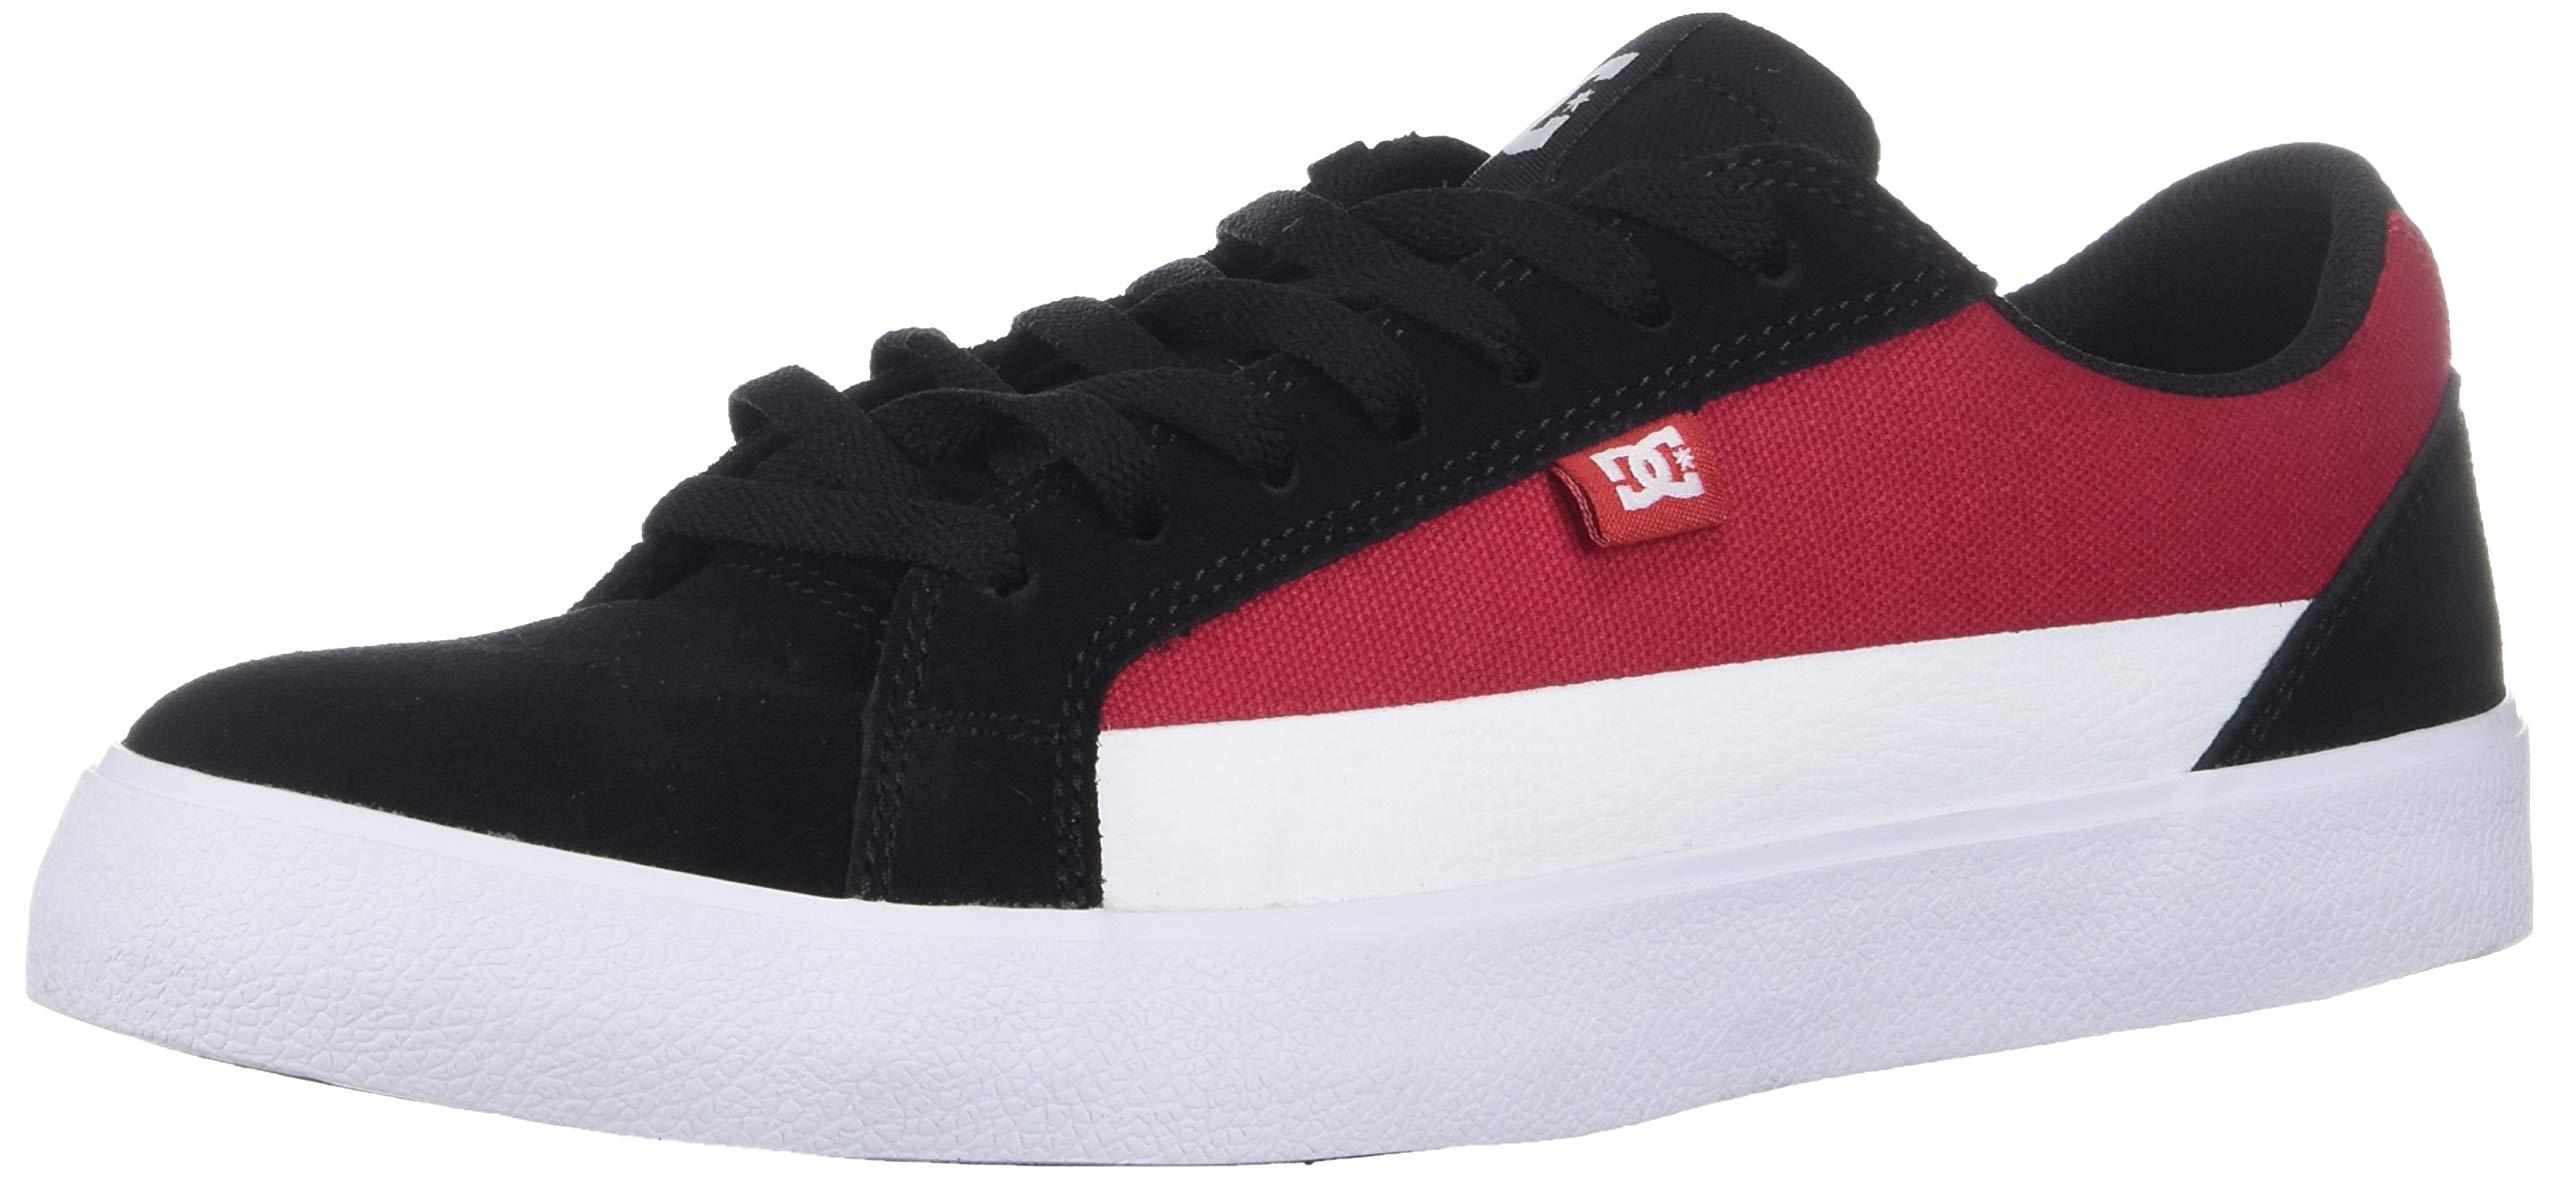 DC Men's LYNNFIELD Skate Shoe, Black/red/White, 7 D M US by DC